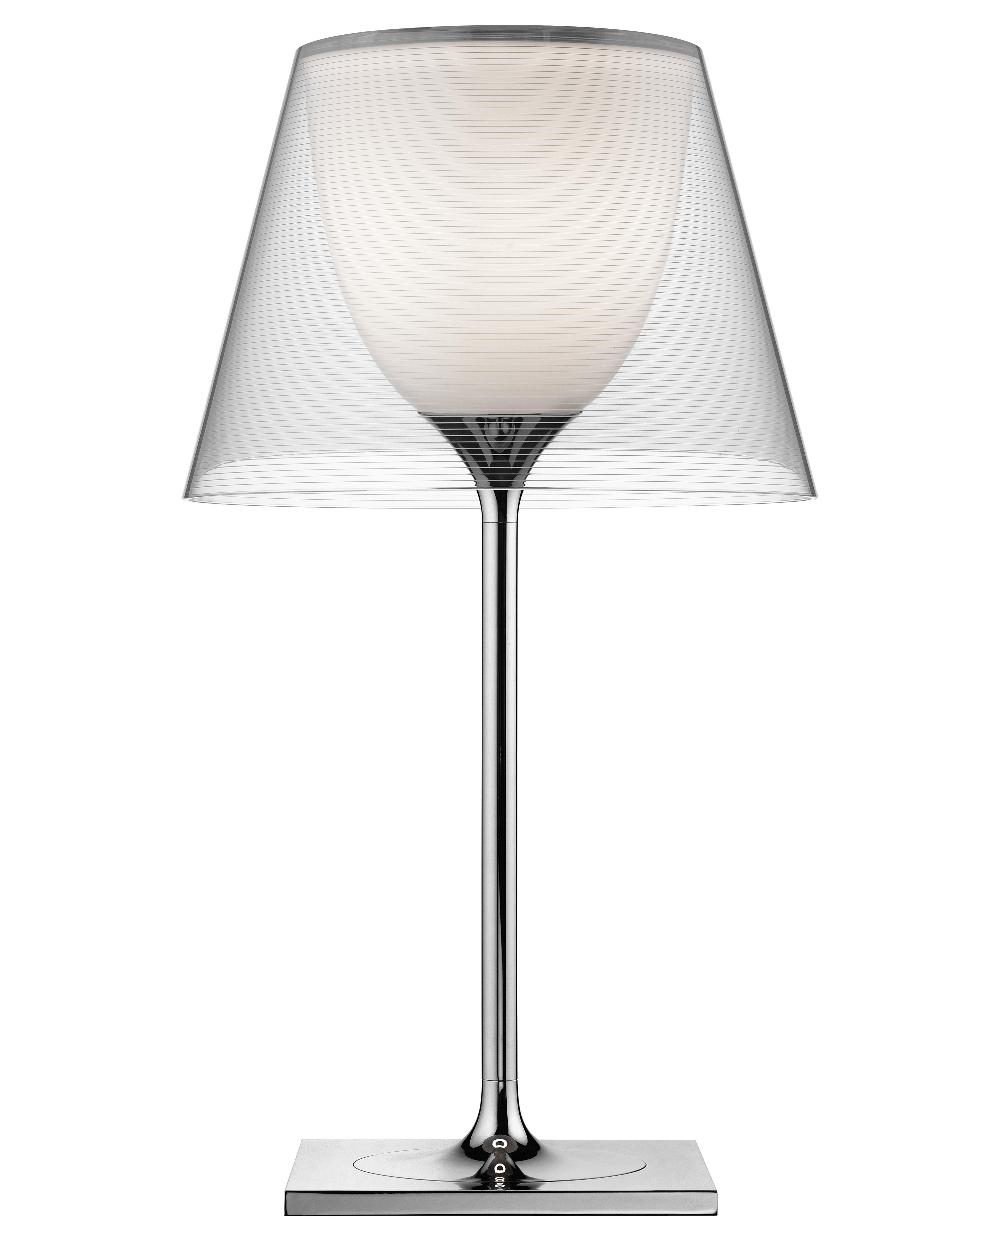 Lampe De Table K Tribe T1 Flos Transparent Made In Design En 2020 Abat Jour Moderne Lampe Lampes De Table